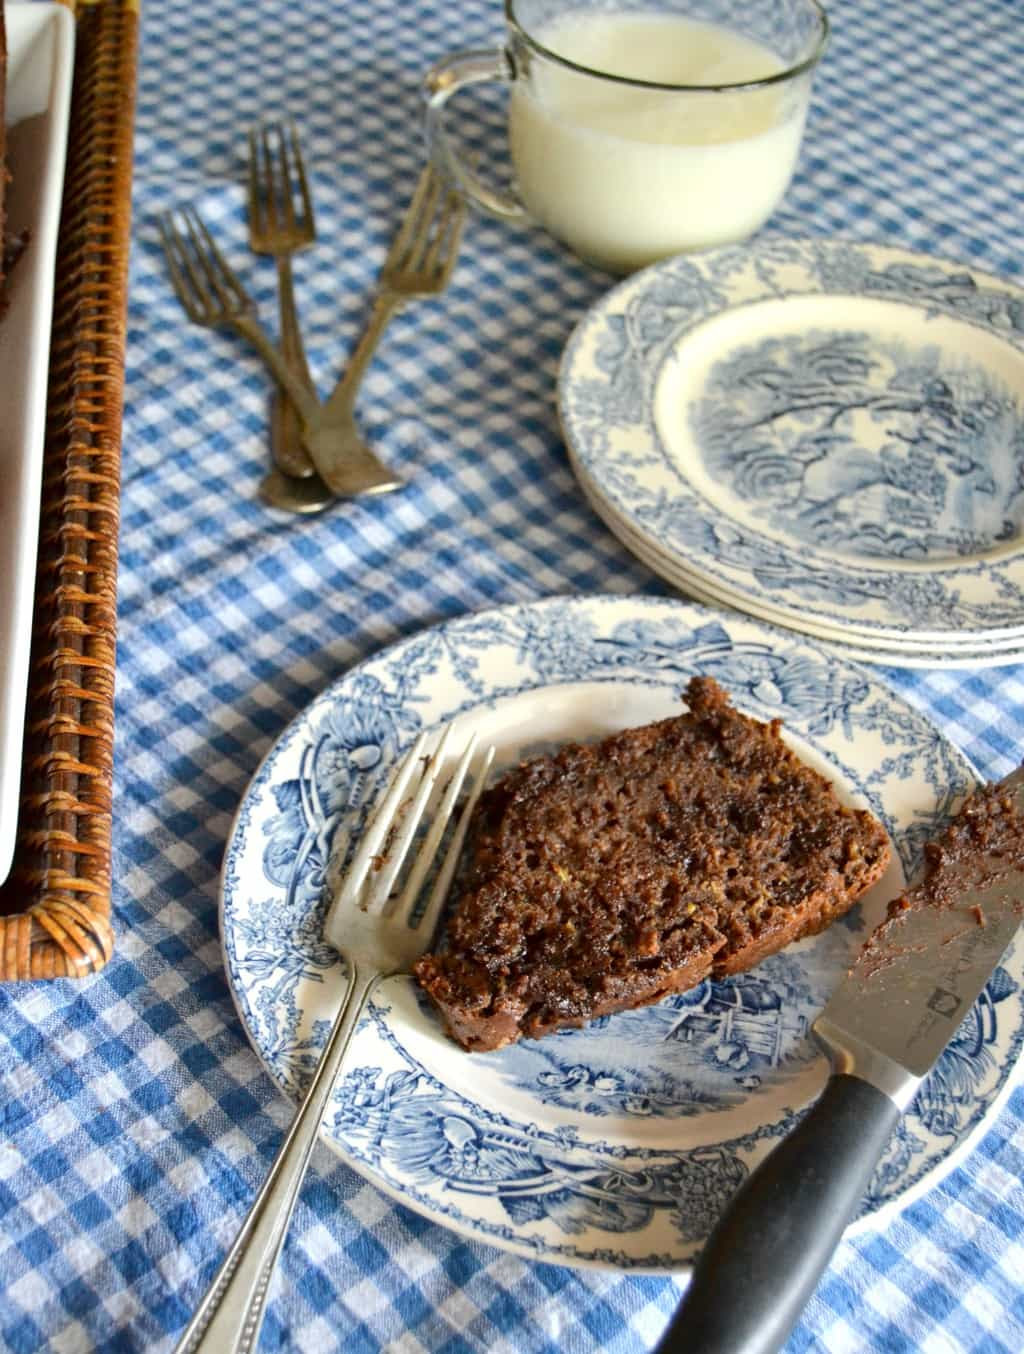 Easy Chocolate Zucchini Bread - My Creative Days